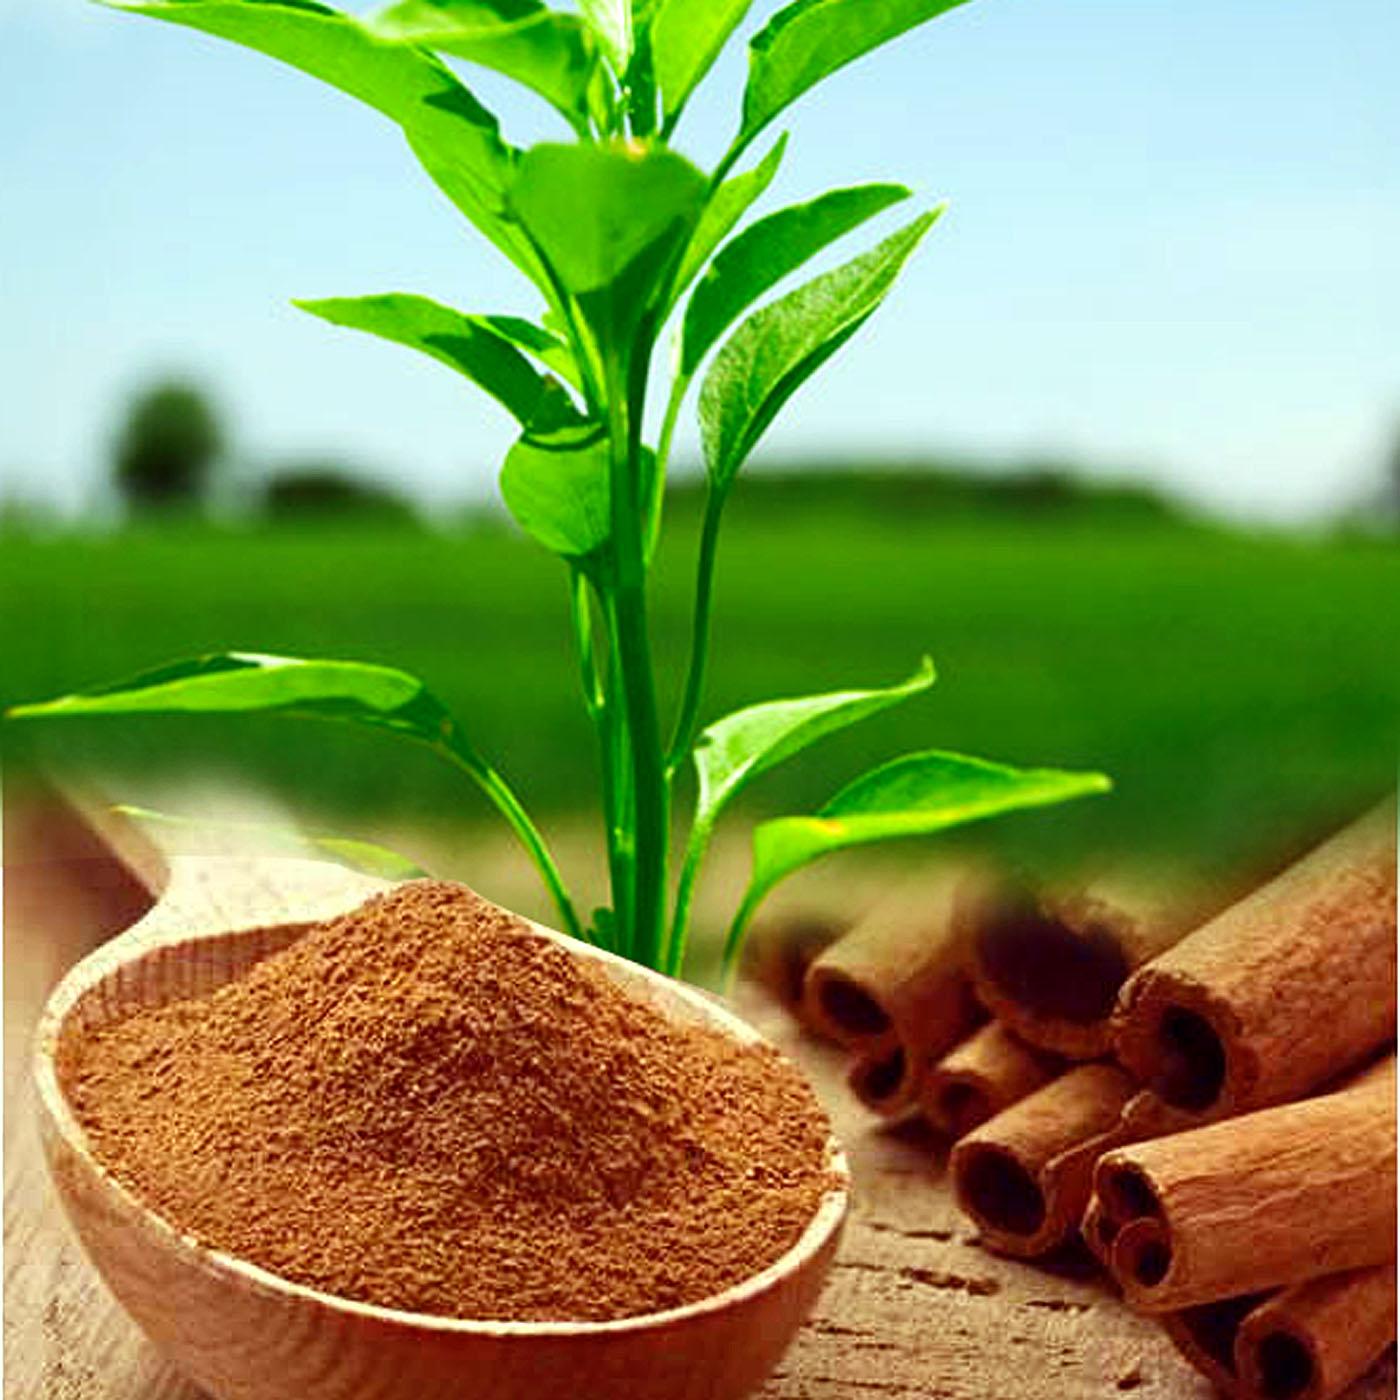 7 Surprising ways to use Cinnamon in the garden | Garden benefits of Cinnamon